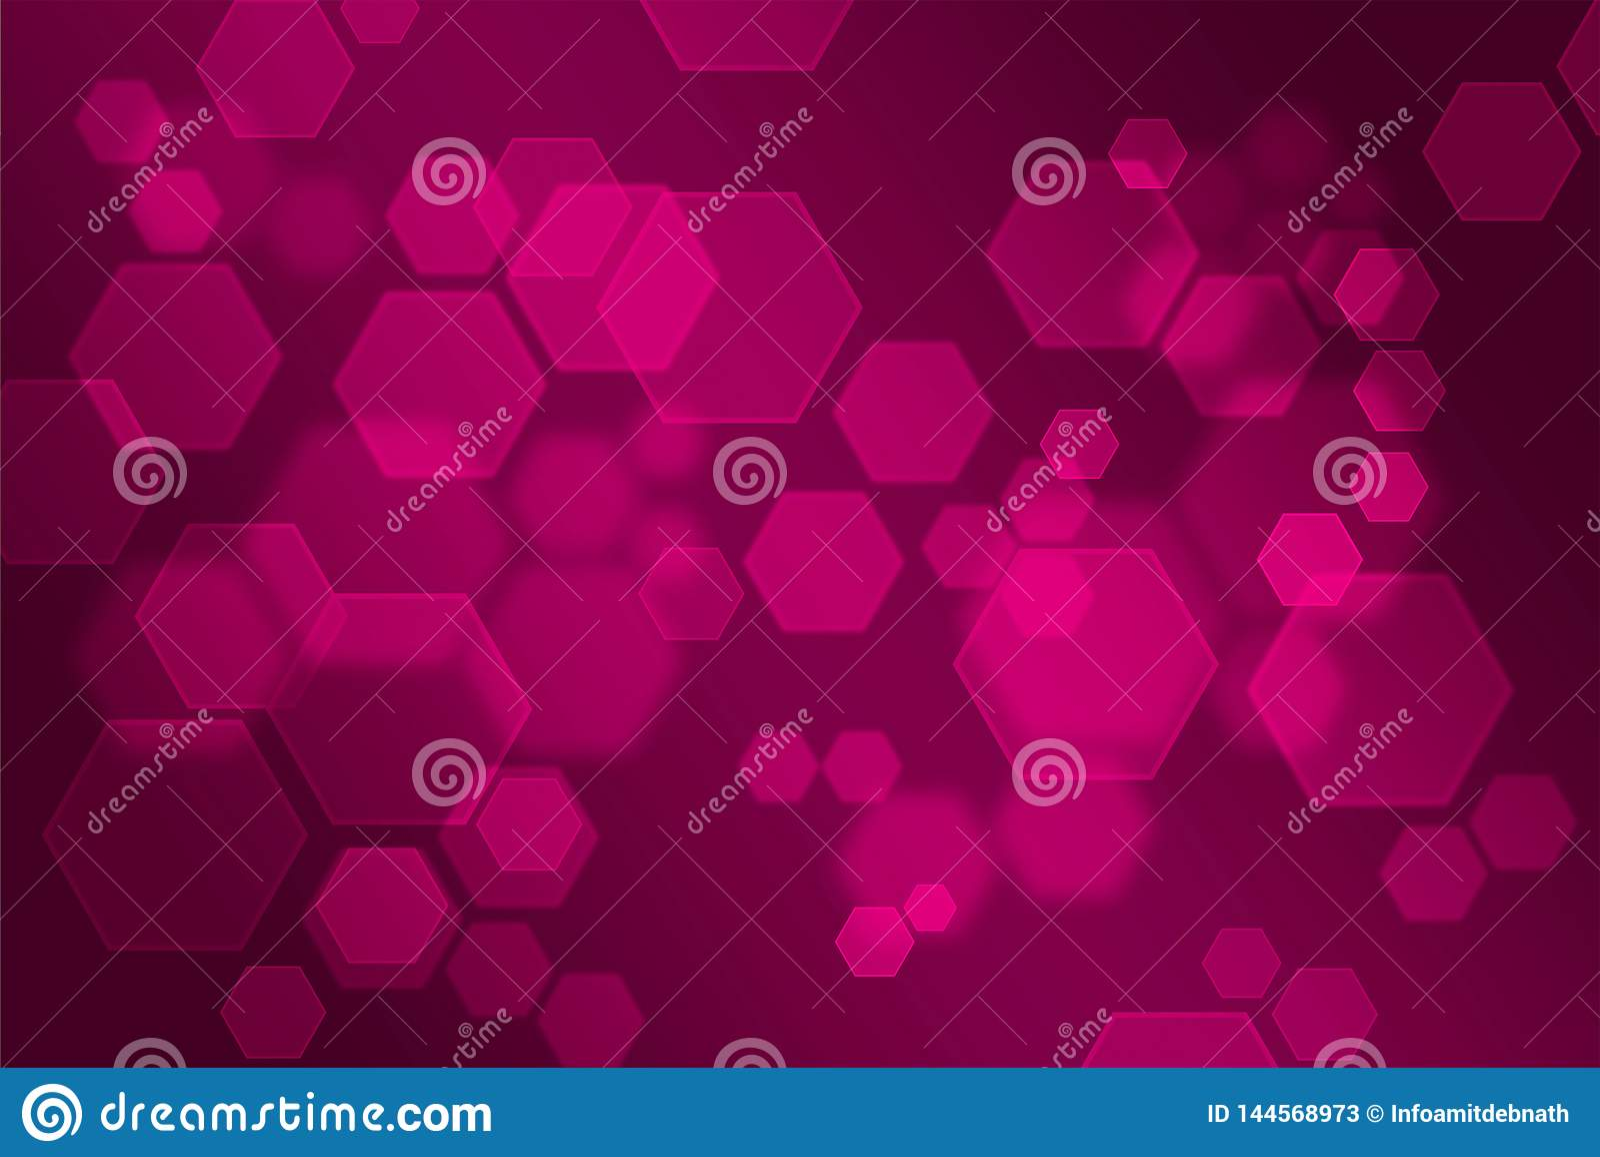 Fondo abstracto, extracto como fondo rosado